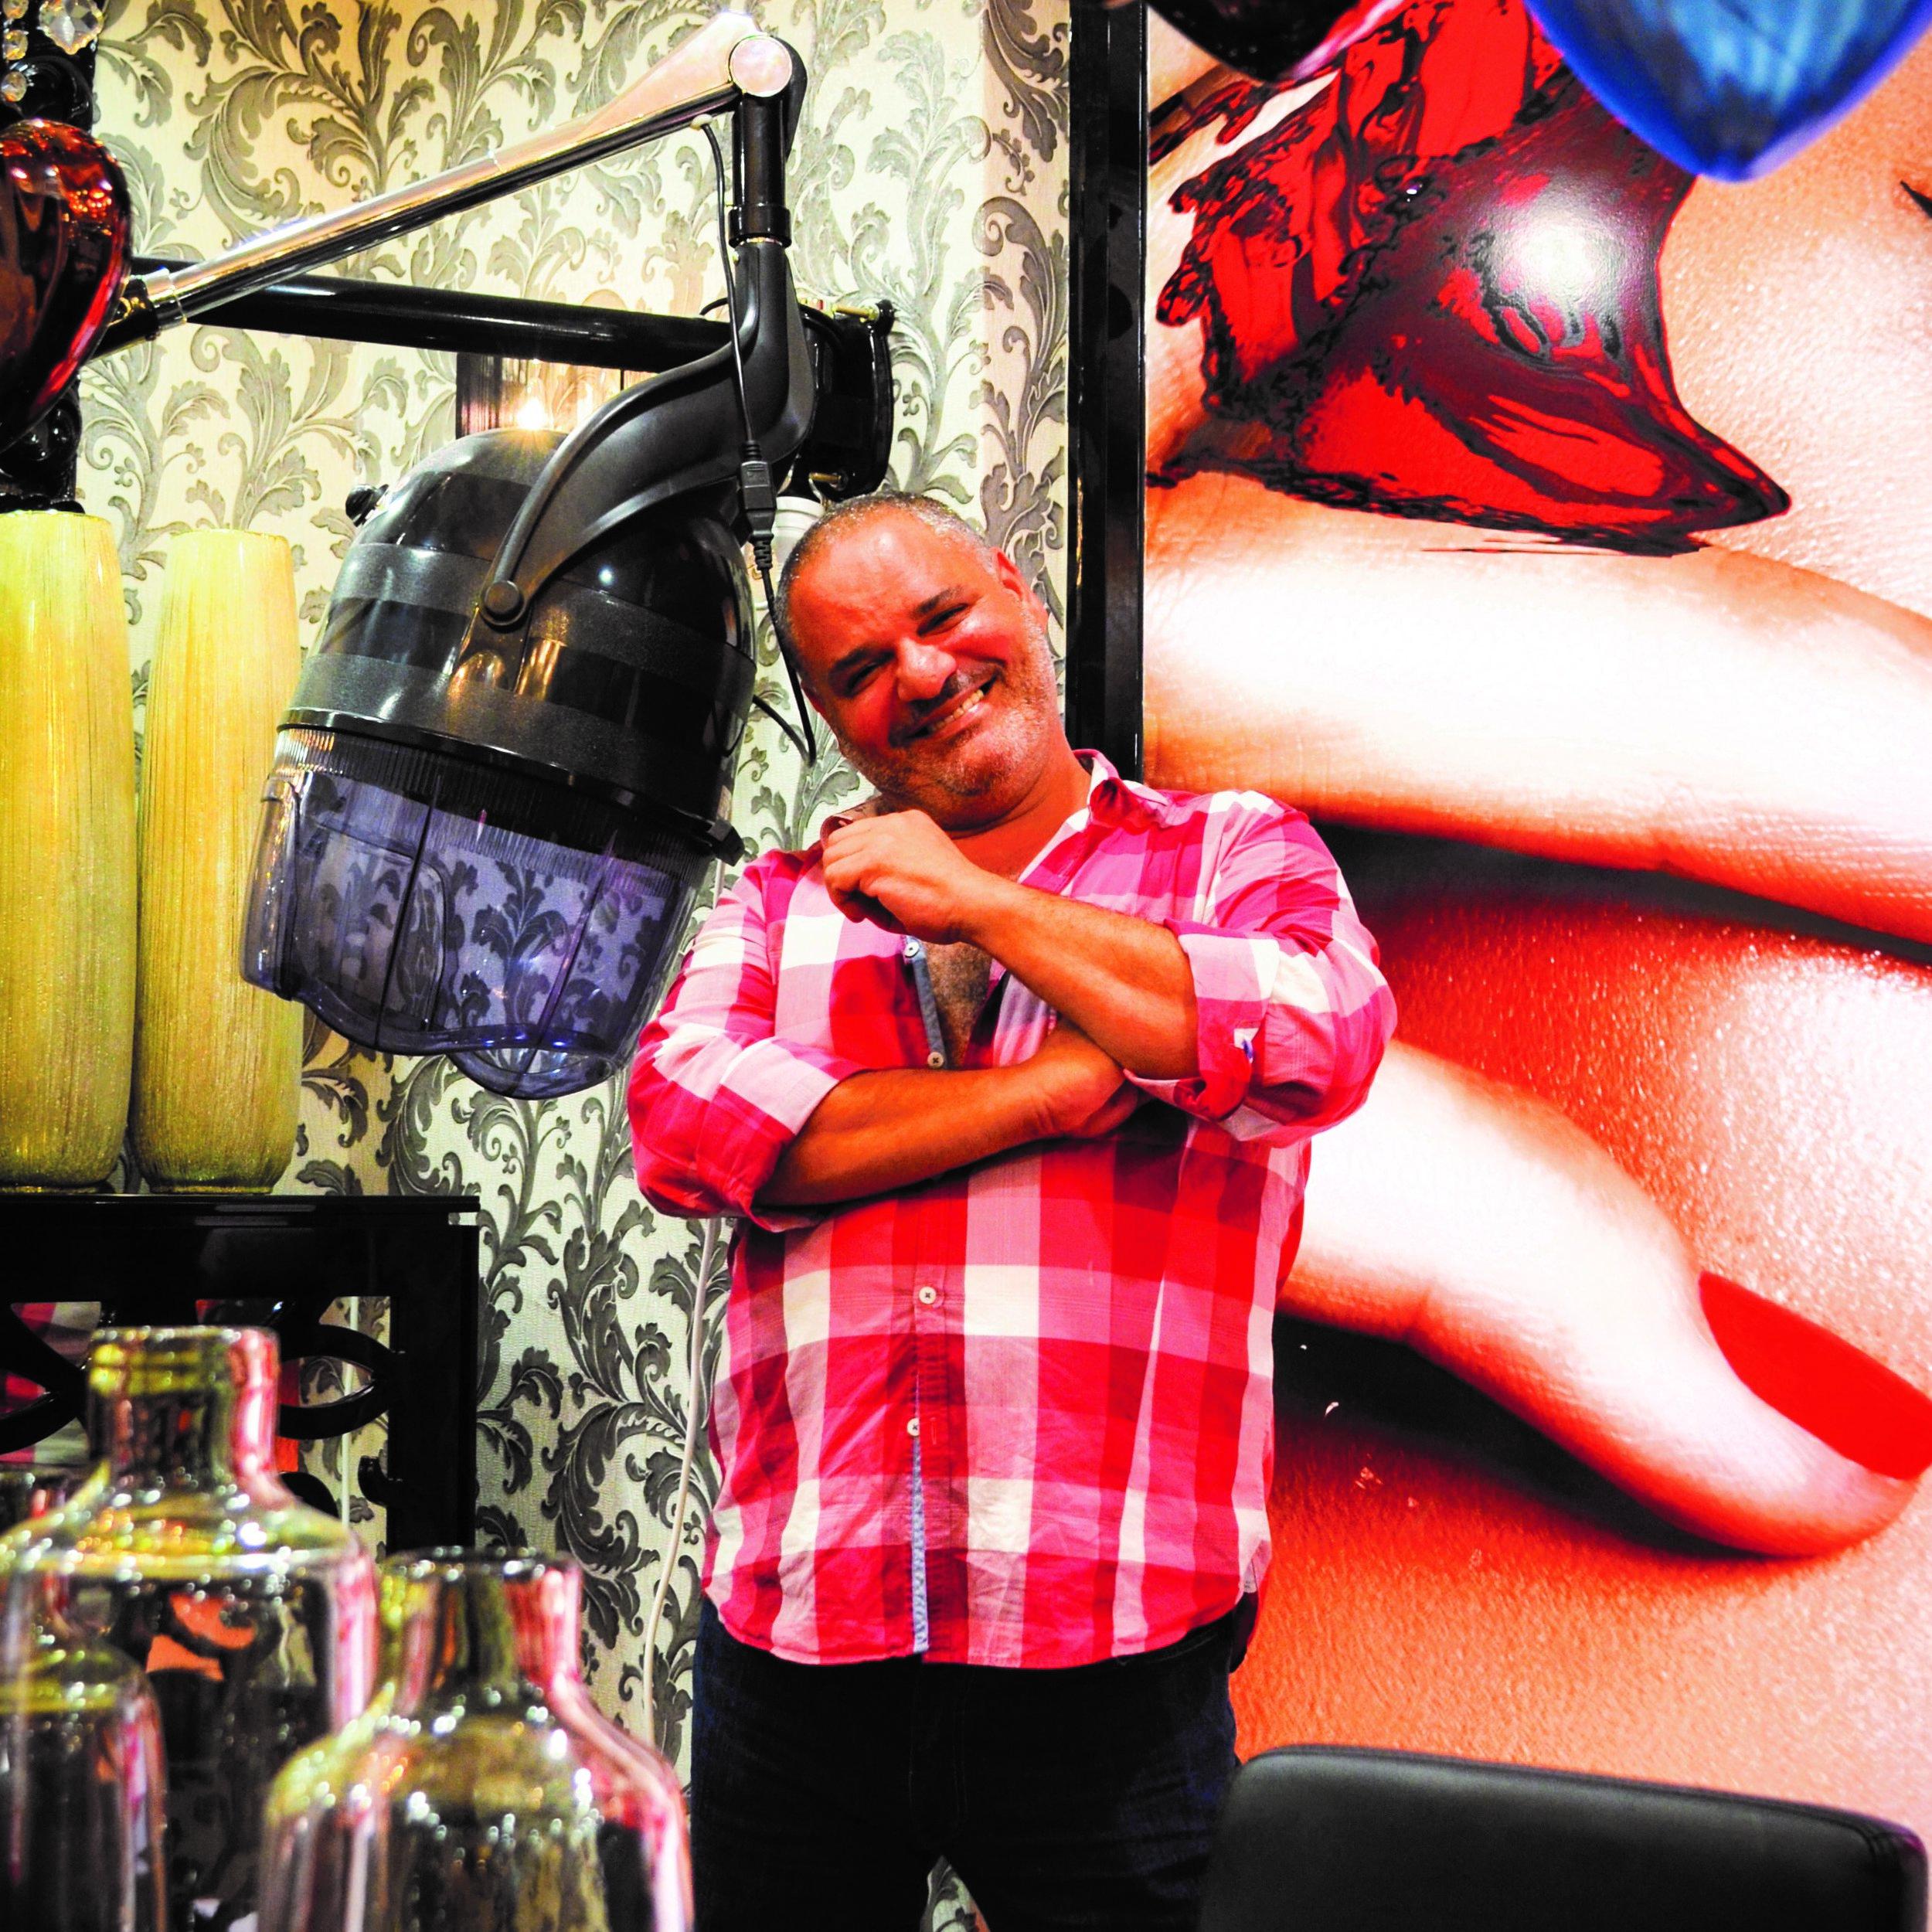 Mario Murace World Entrepreneur of the Year 2004 - Hair & Beauty Industry